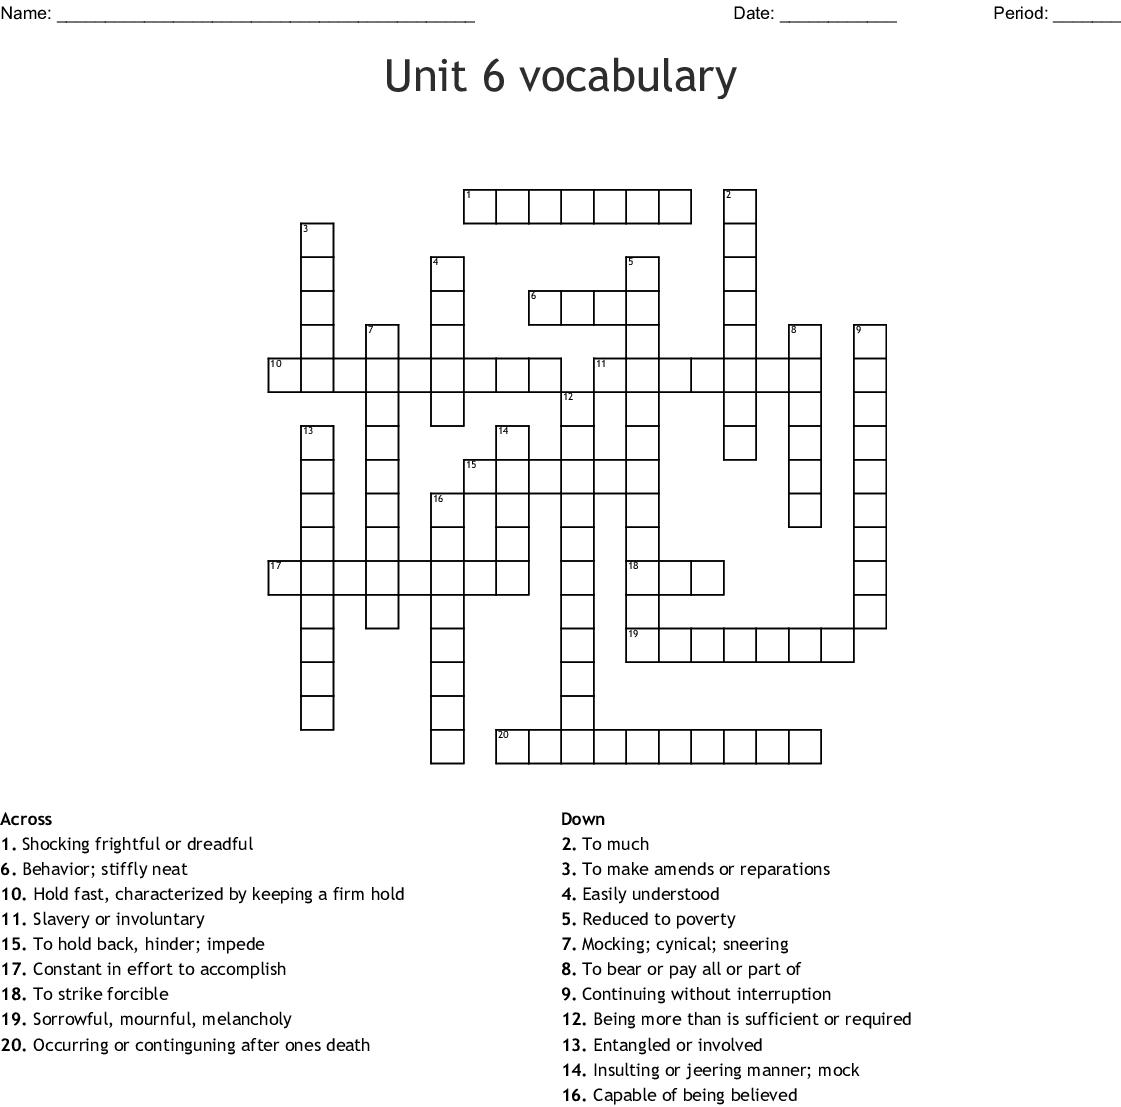 Vocabulary Units 4 5 6 Crossword